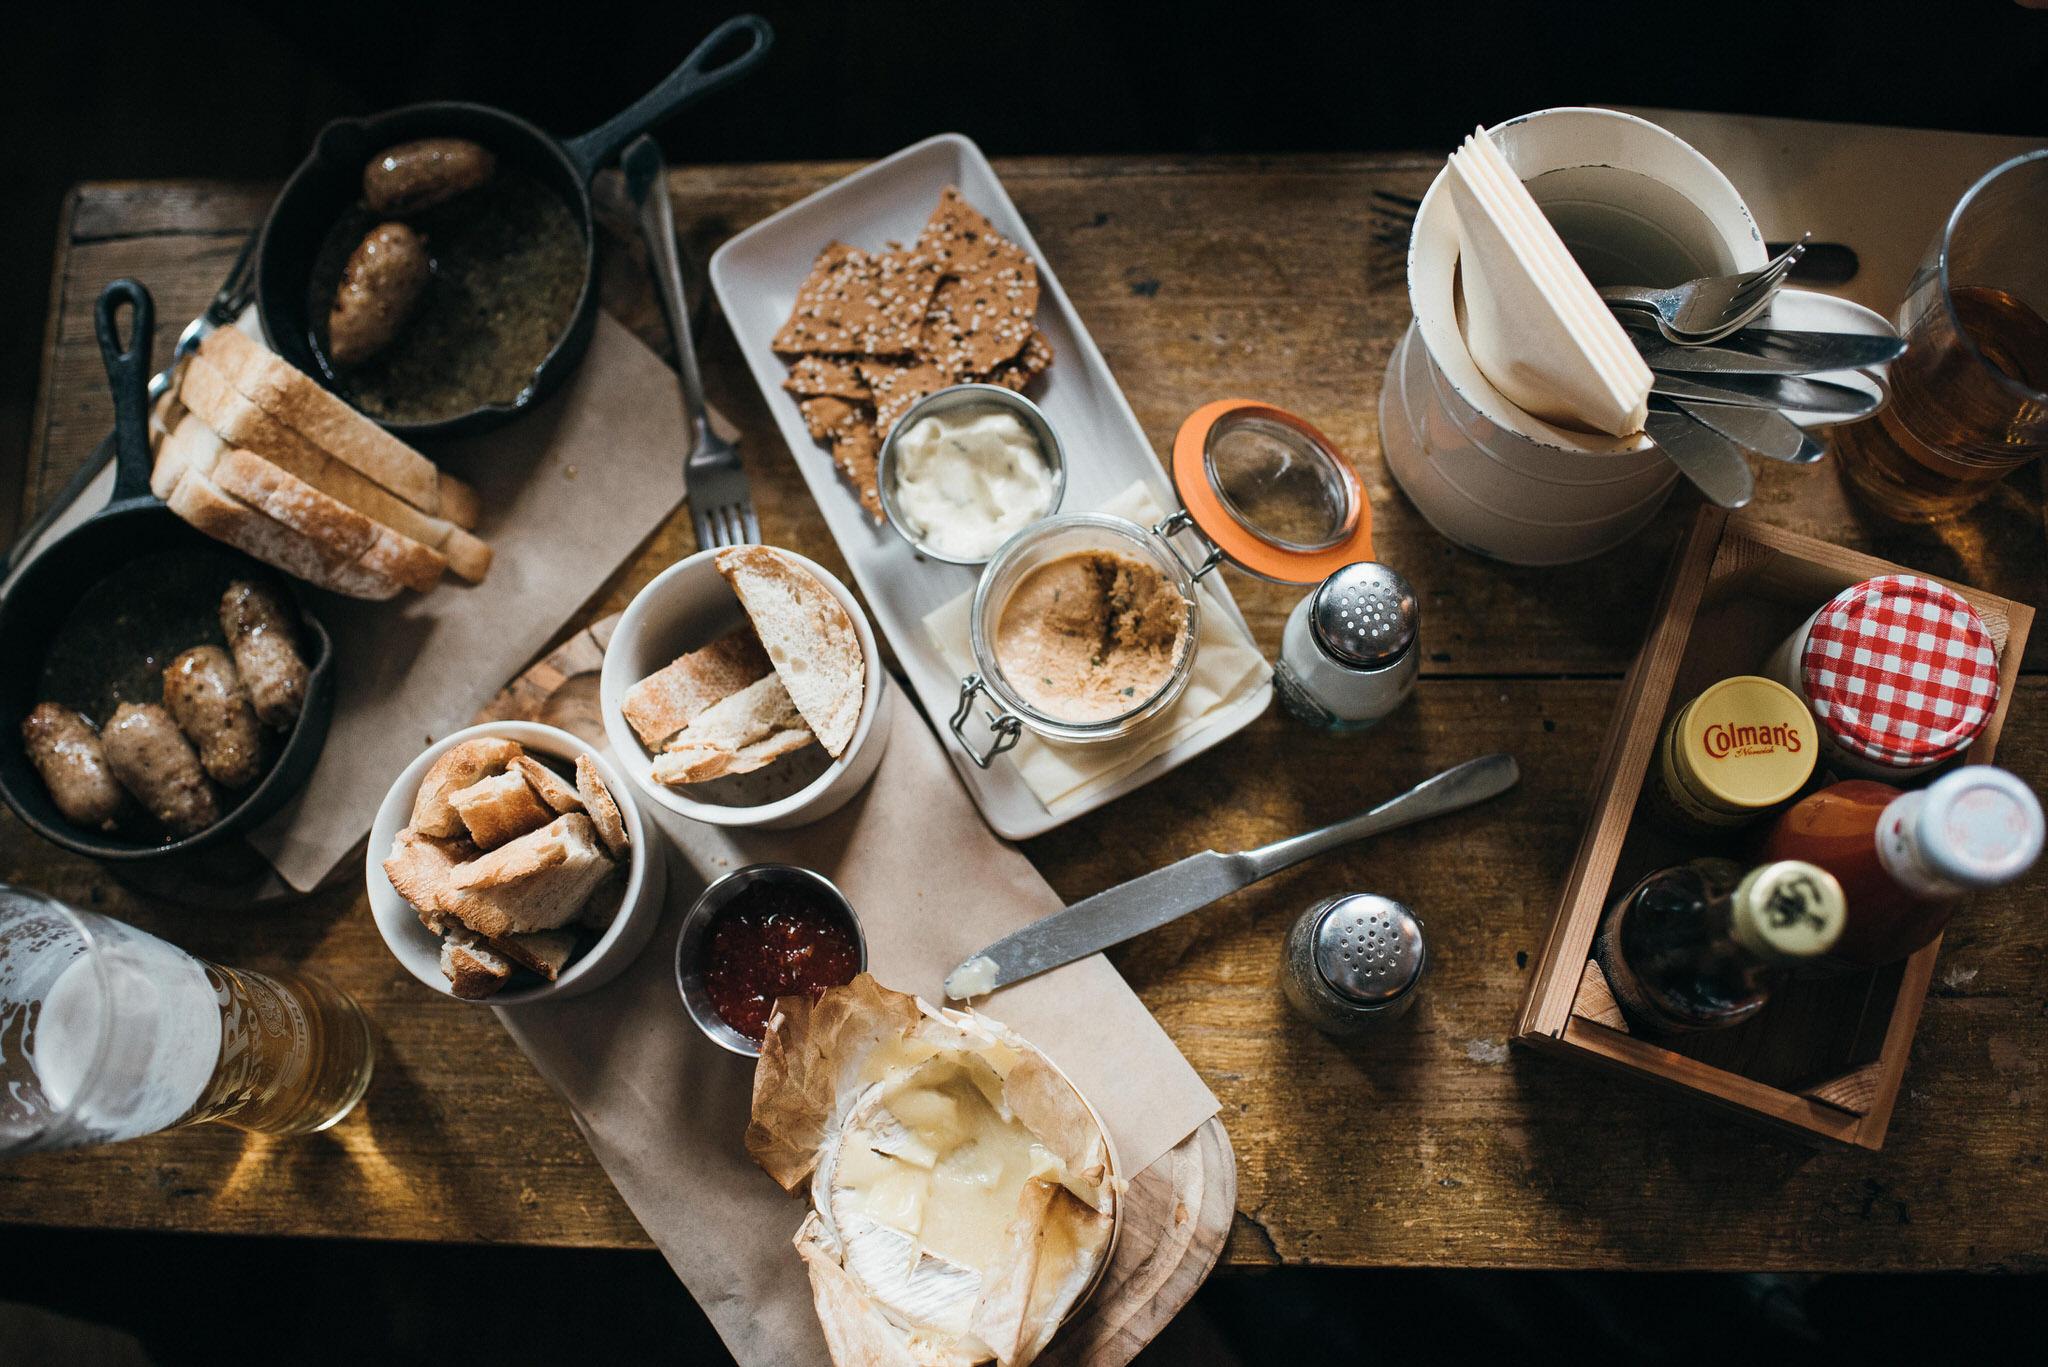 Tasty platter at The Crooked Billet